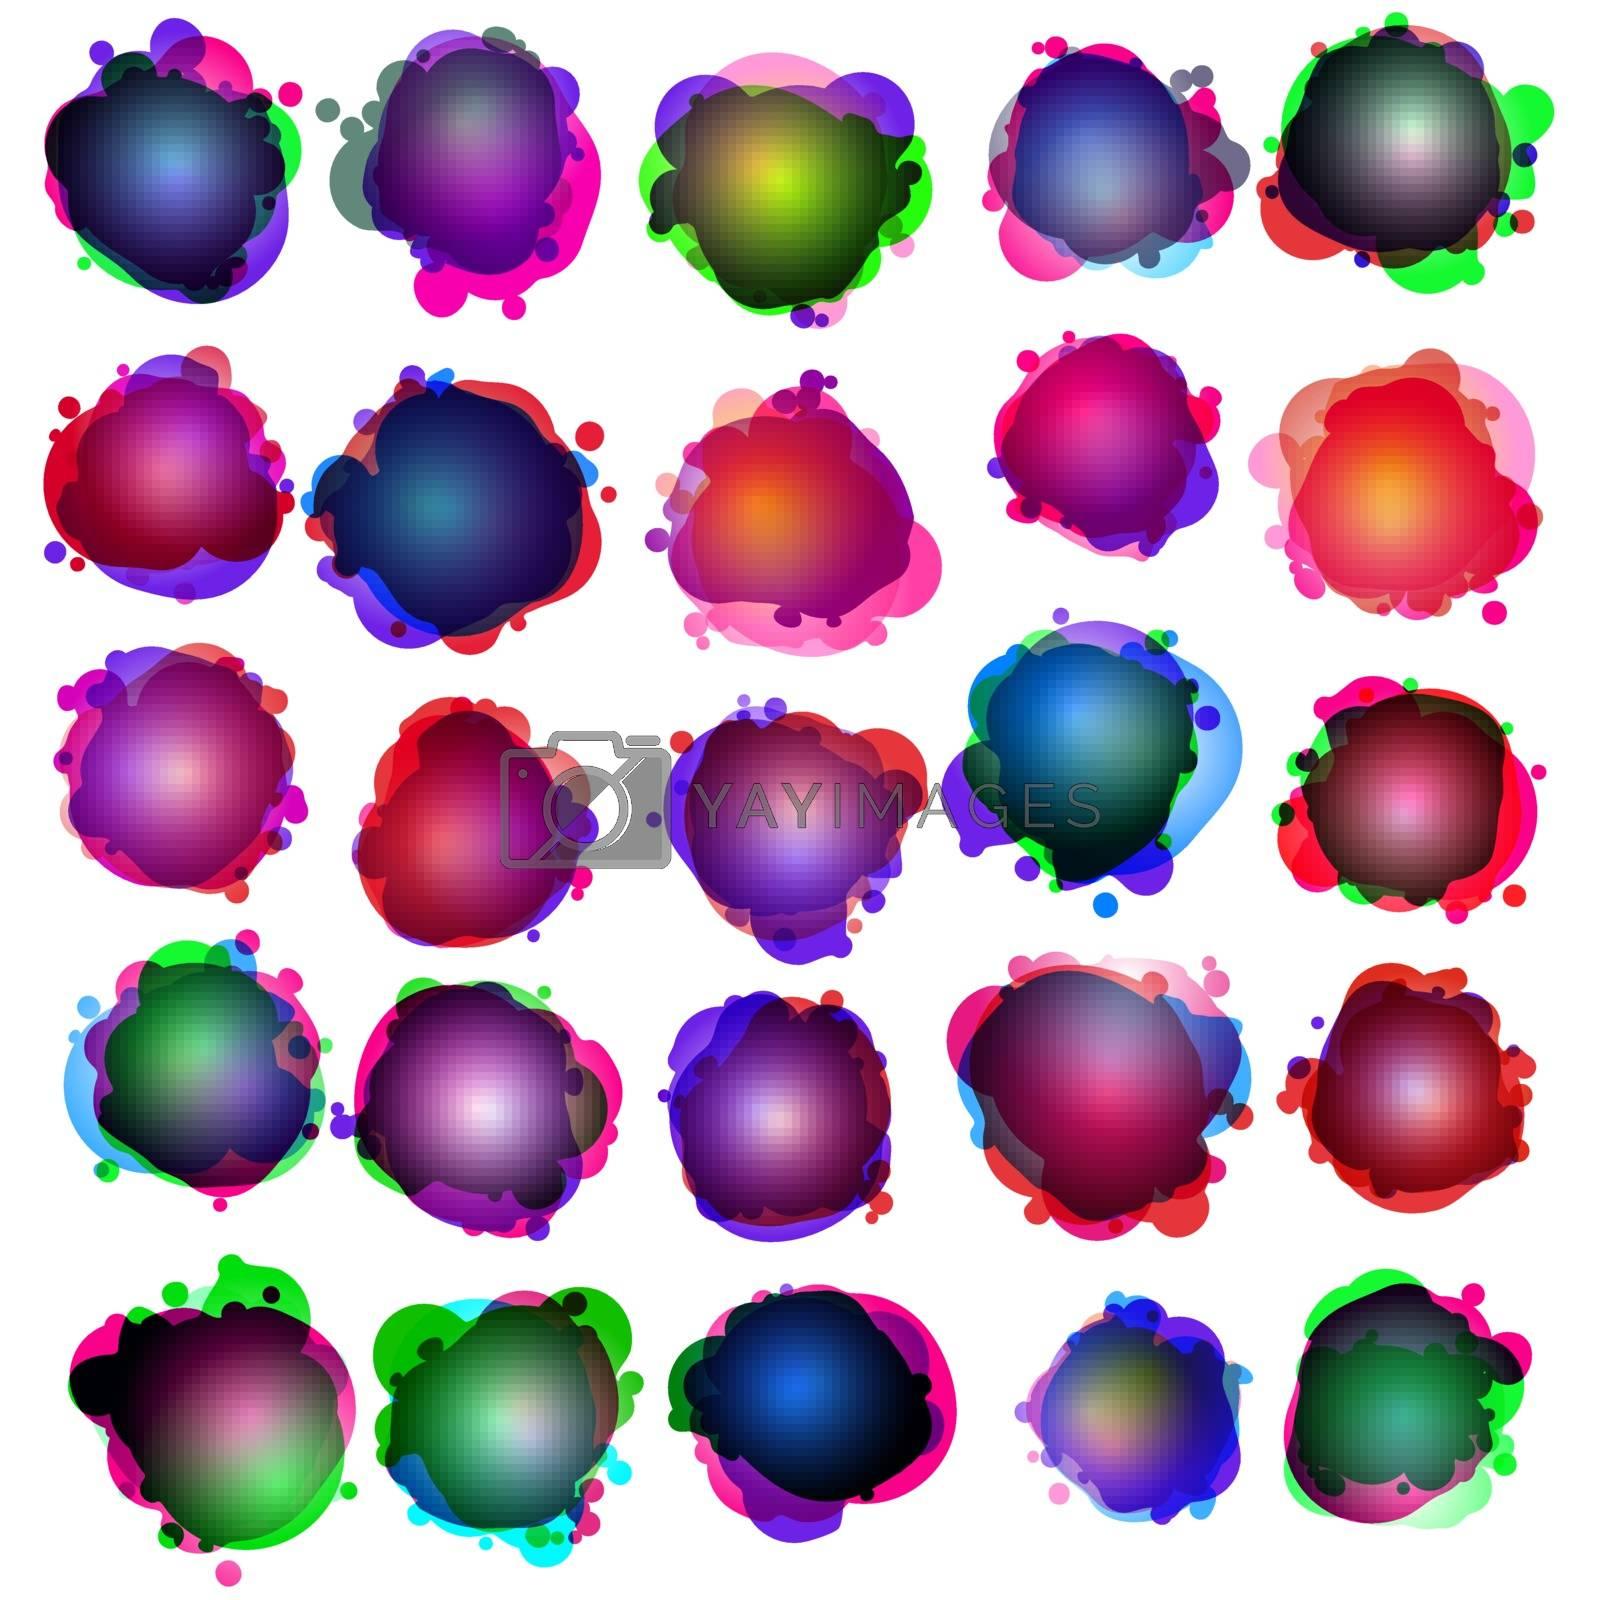 Speech bubbles. Original illustration. EPS 10 vector file included